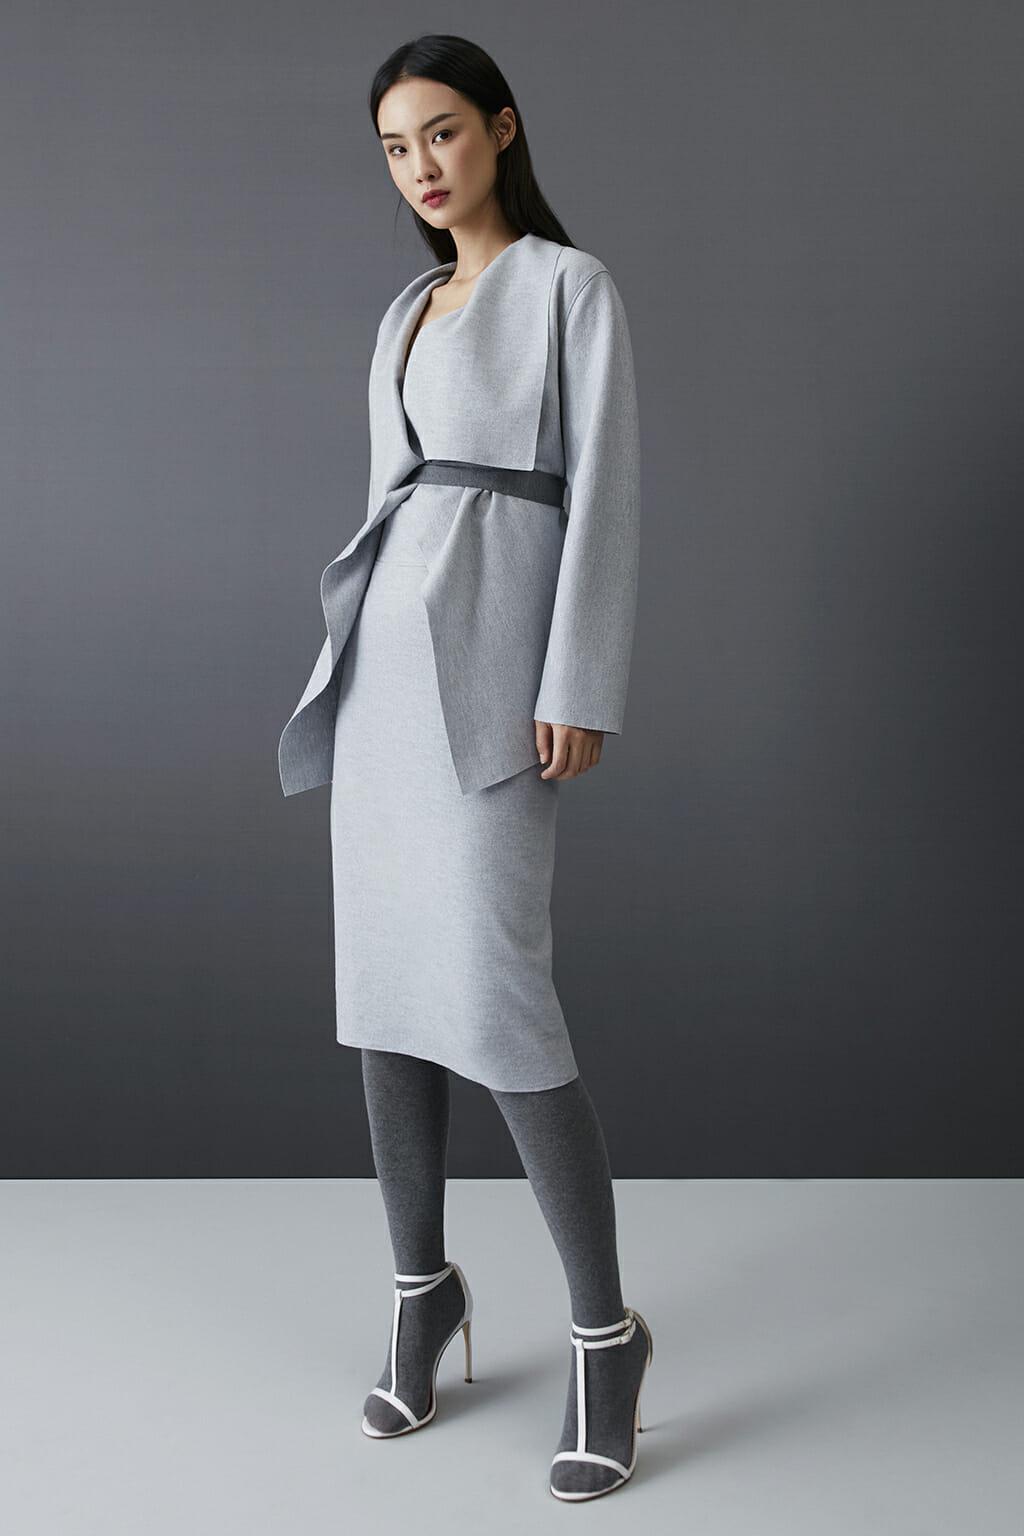 ch-carolina-herrera-fashion-fall-2018-wool-grey